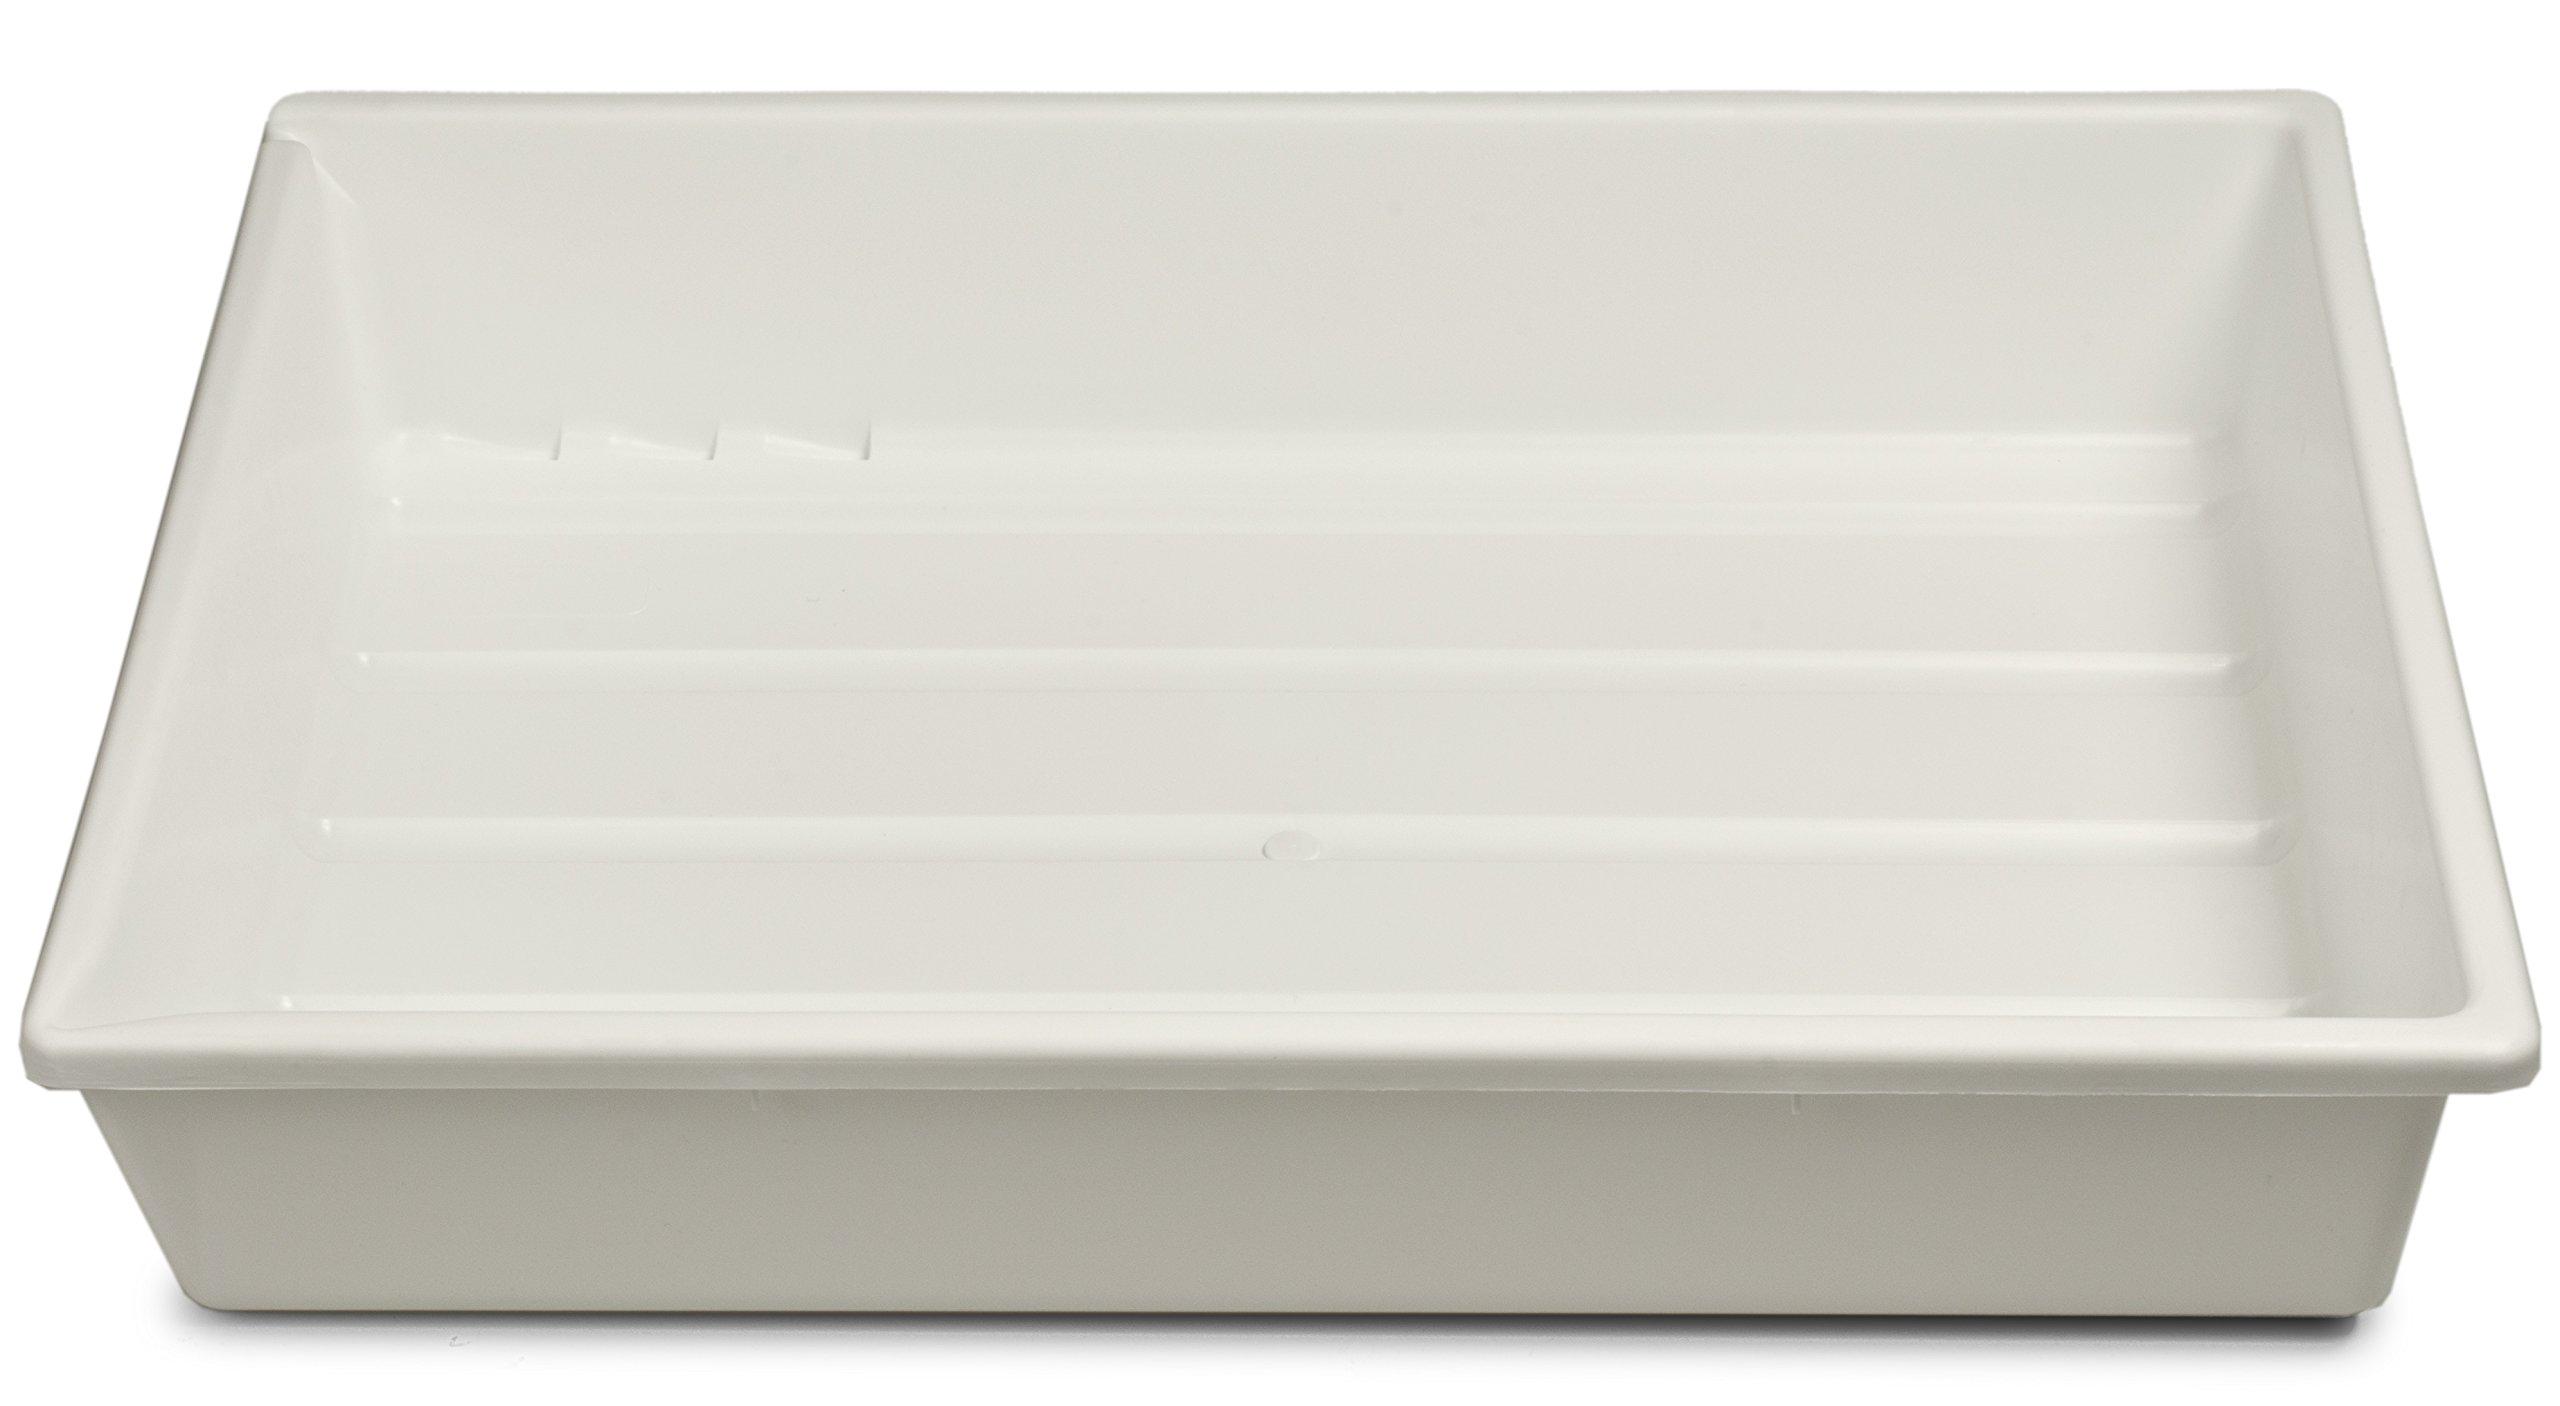 Kaiser 204171 12''x16'' Lab Tray (White) by Kaiser